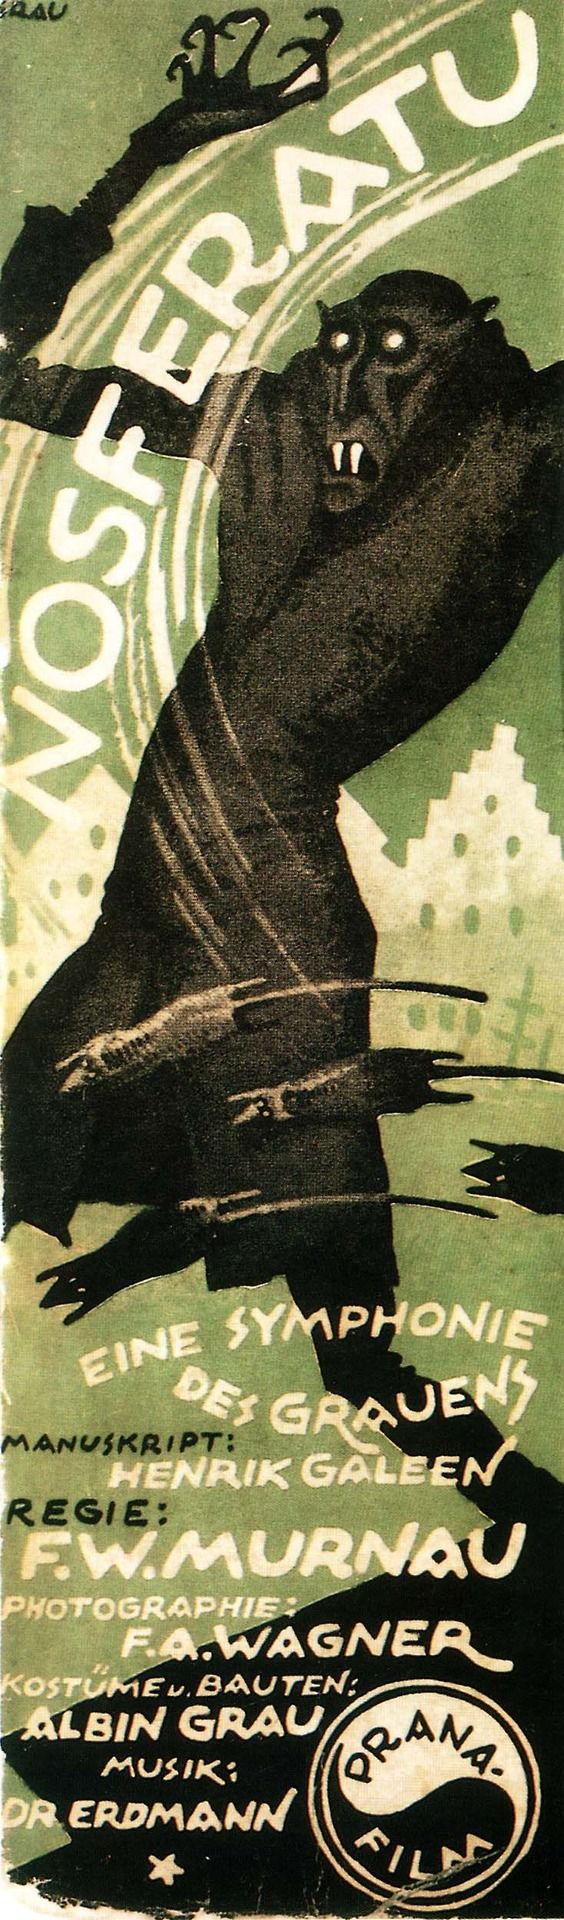 Nosferatu (1922) por Albin Grau | Classic Vintage Movie ...